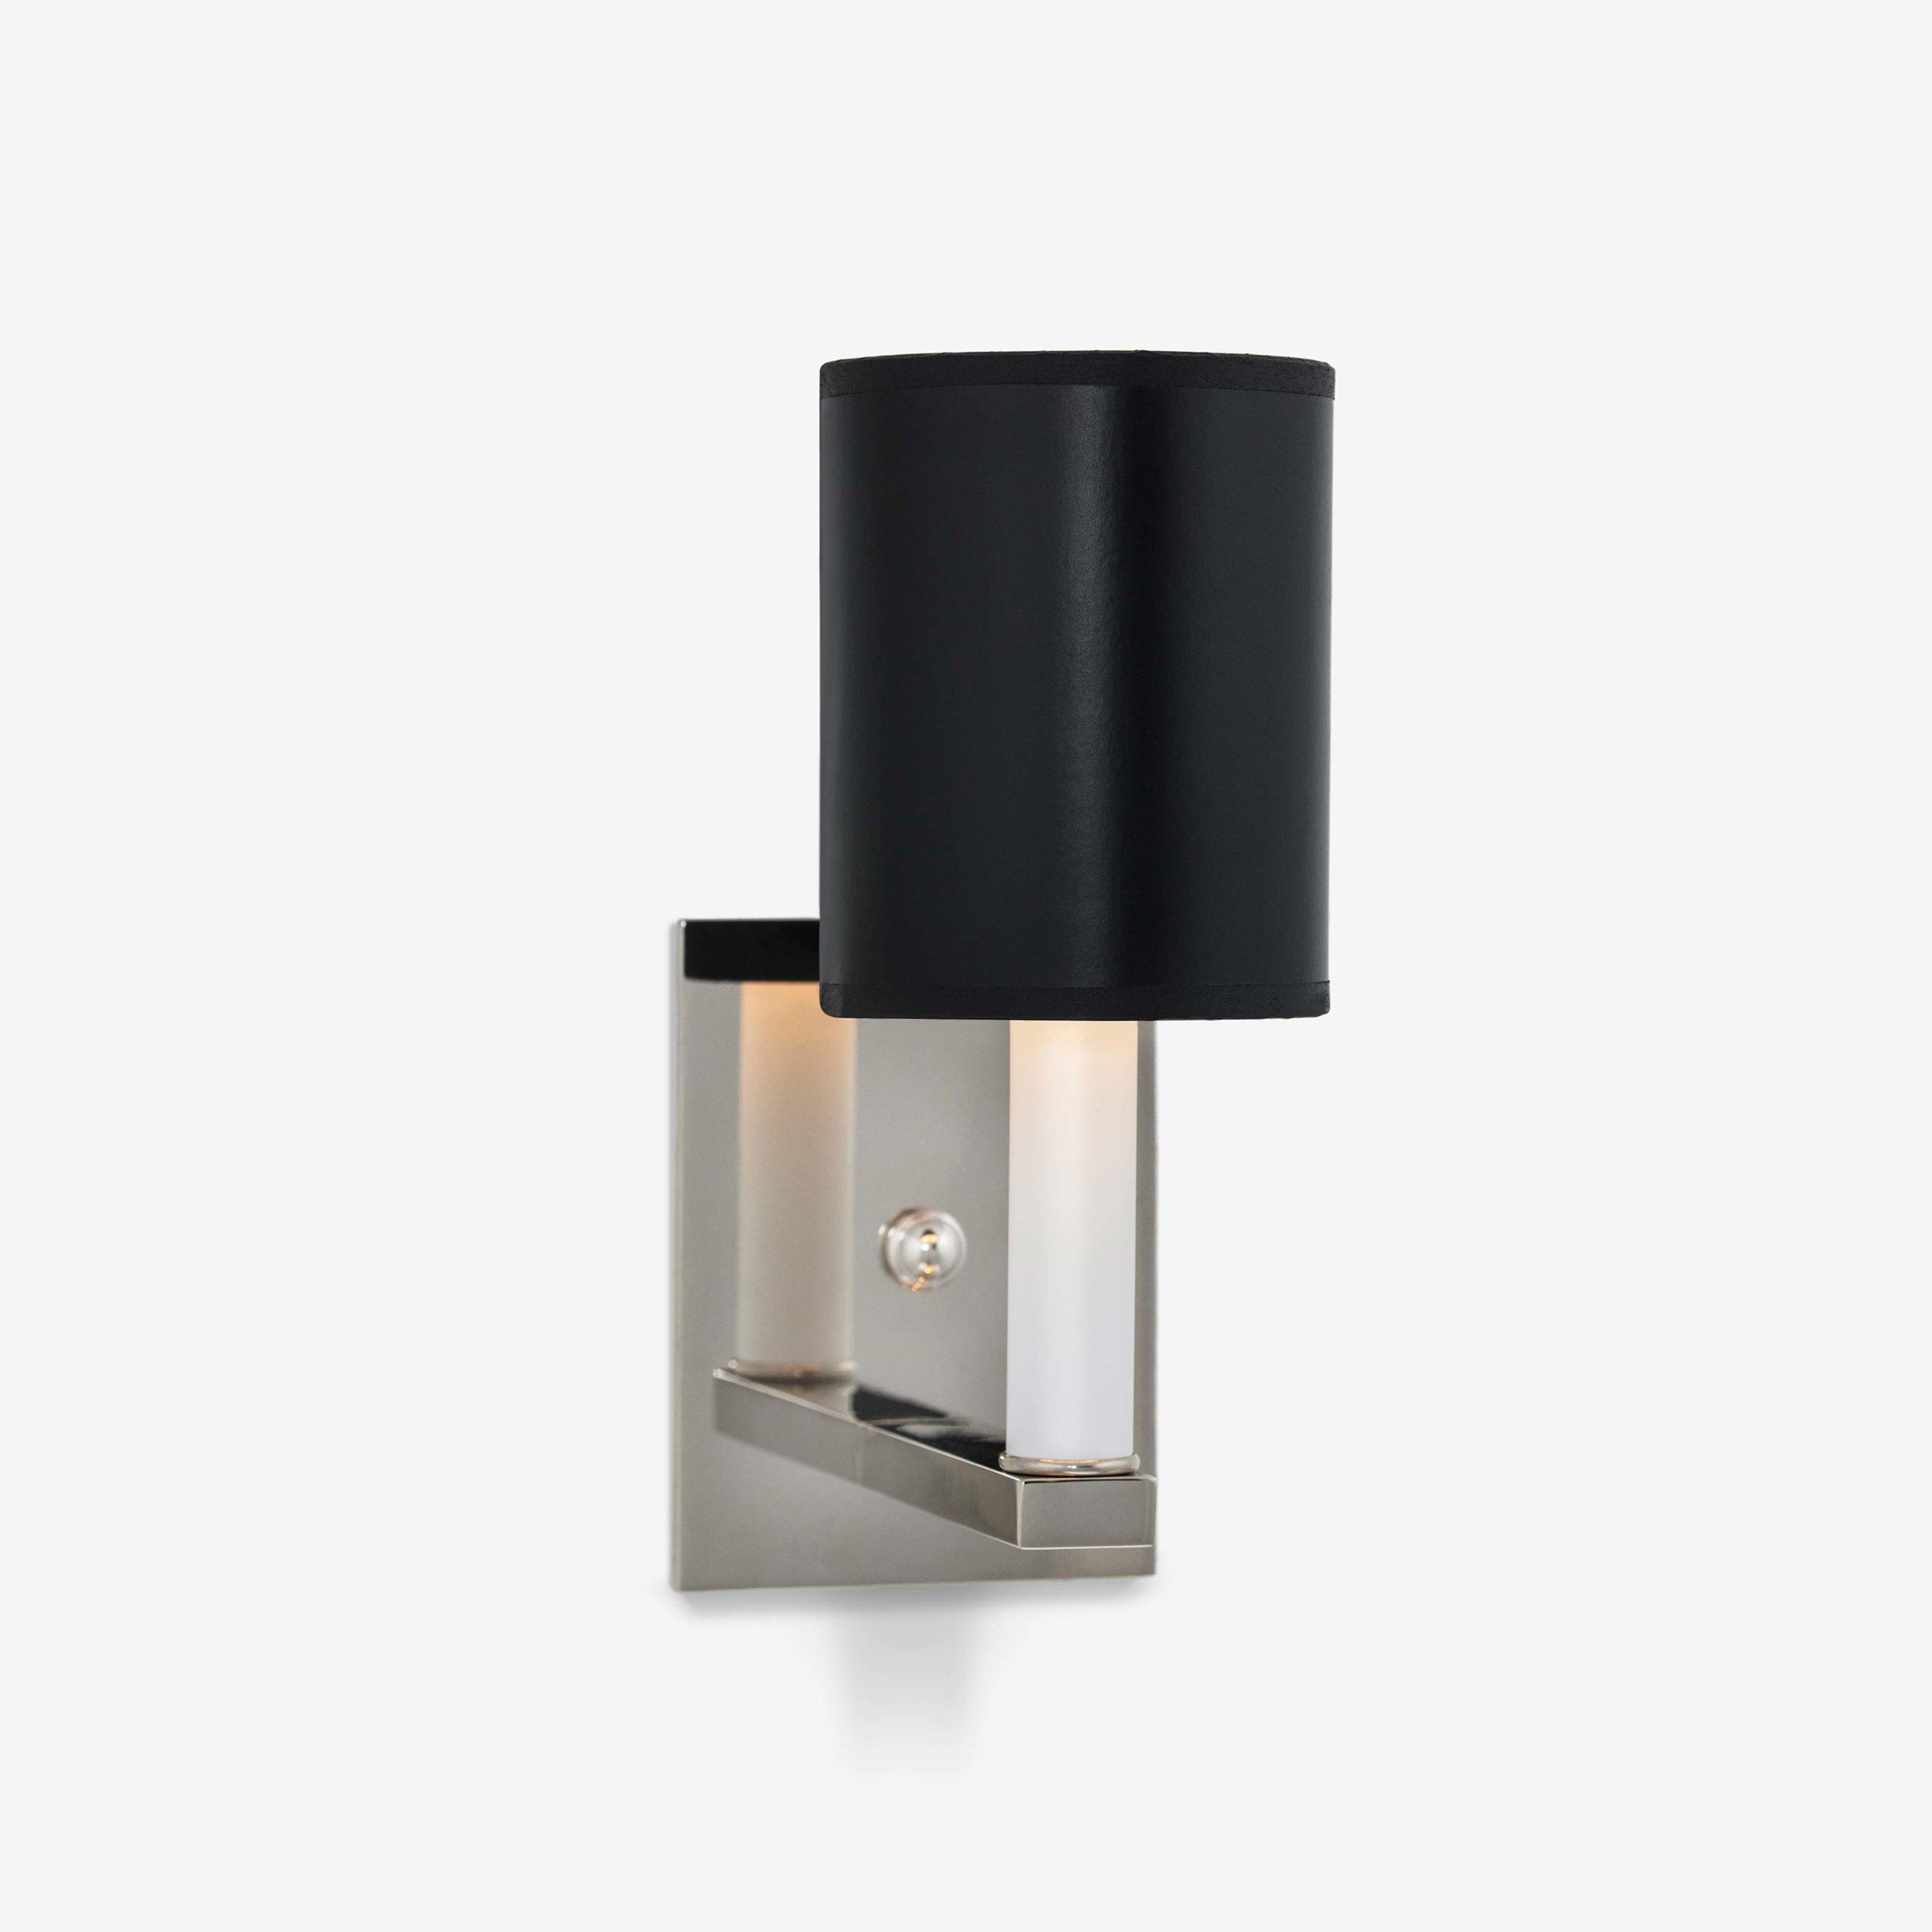 Pin By Pamela Christensen On Bright Light Chandelier In Living Room Light Fixtures Wall Sconces